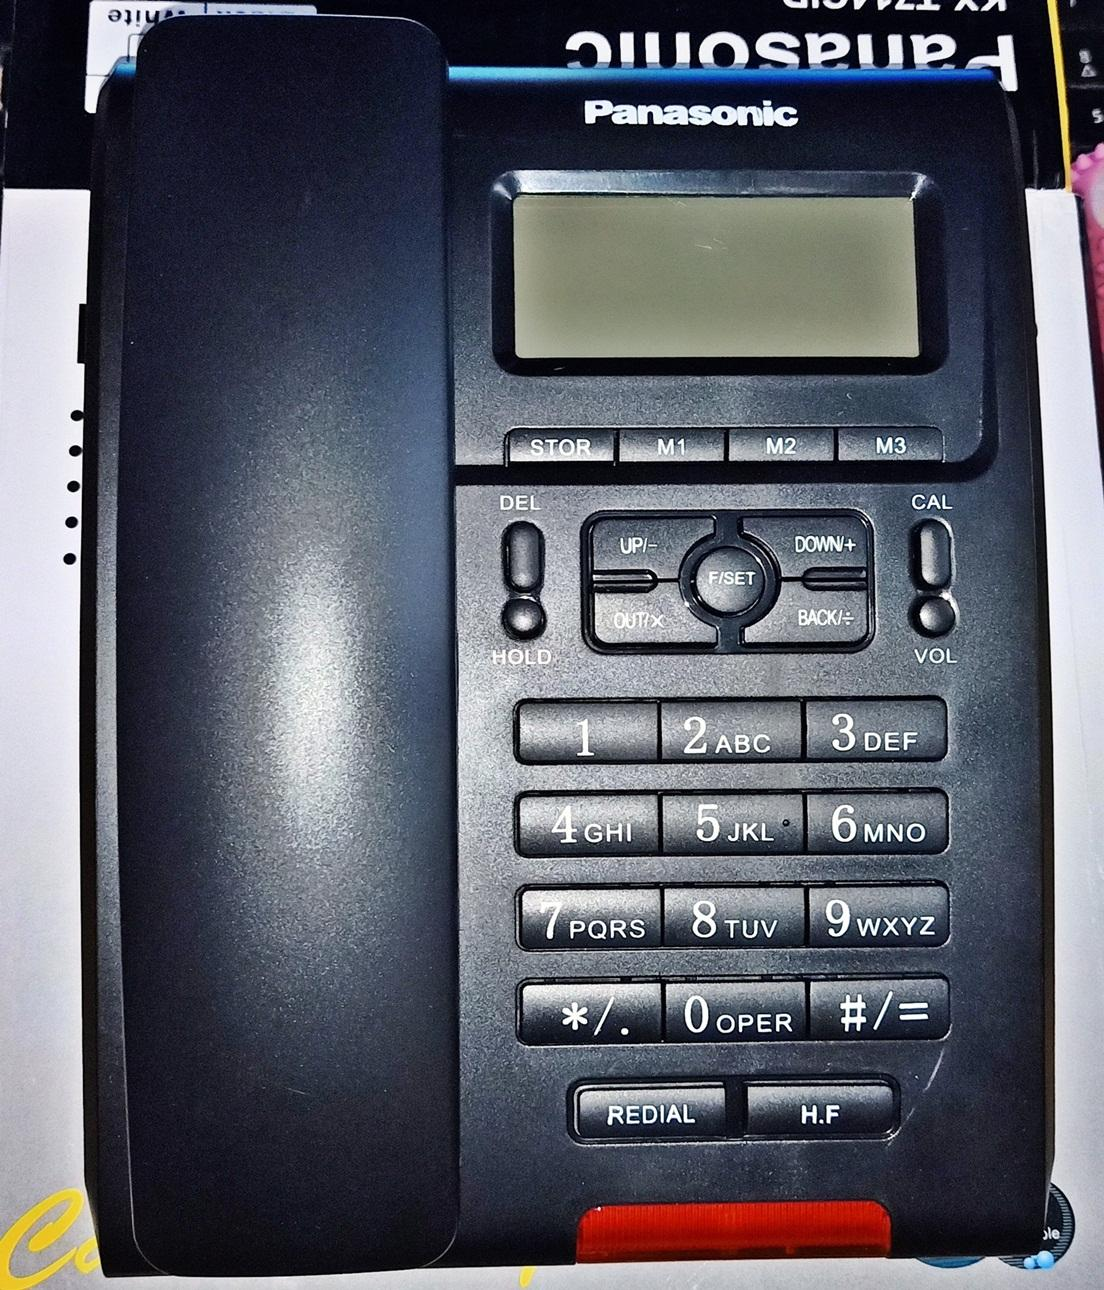 PANASONIC KX-TSC7709CID CALLER ID CORDED PHONE Desktop Phone Landline Phone Telephone Set